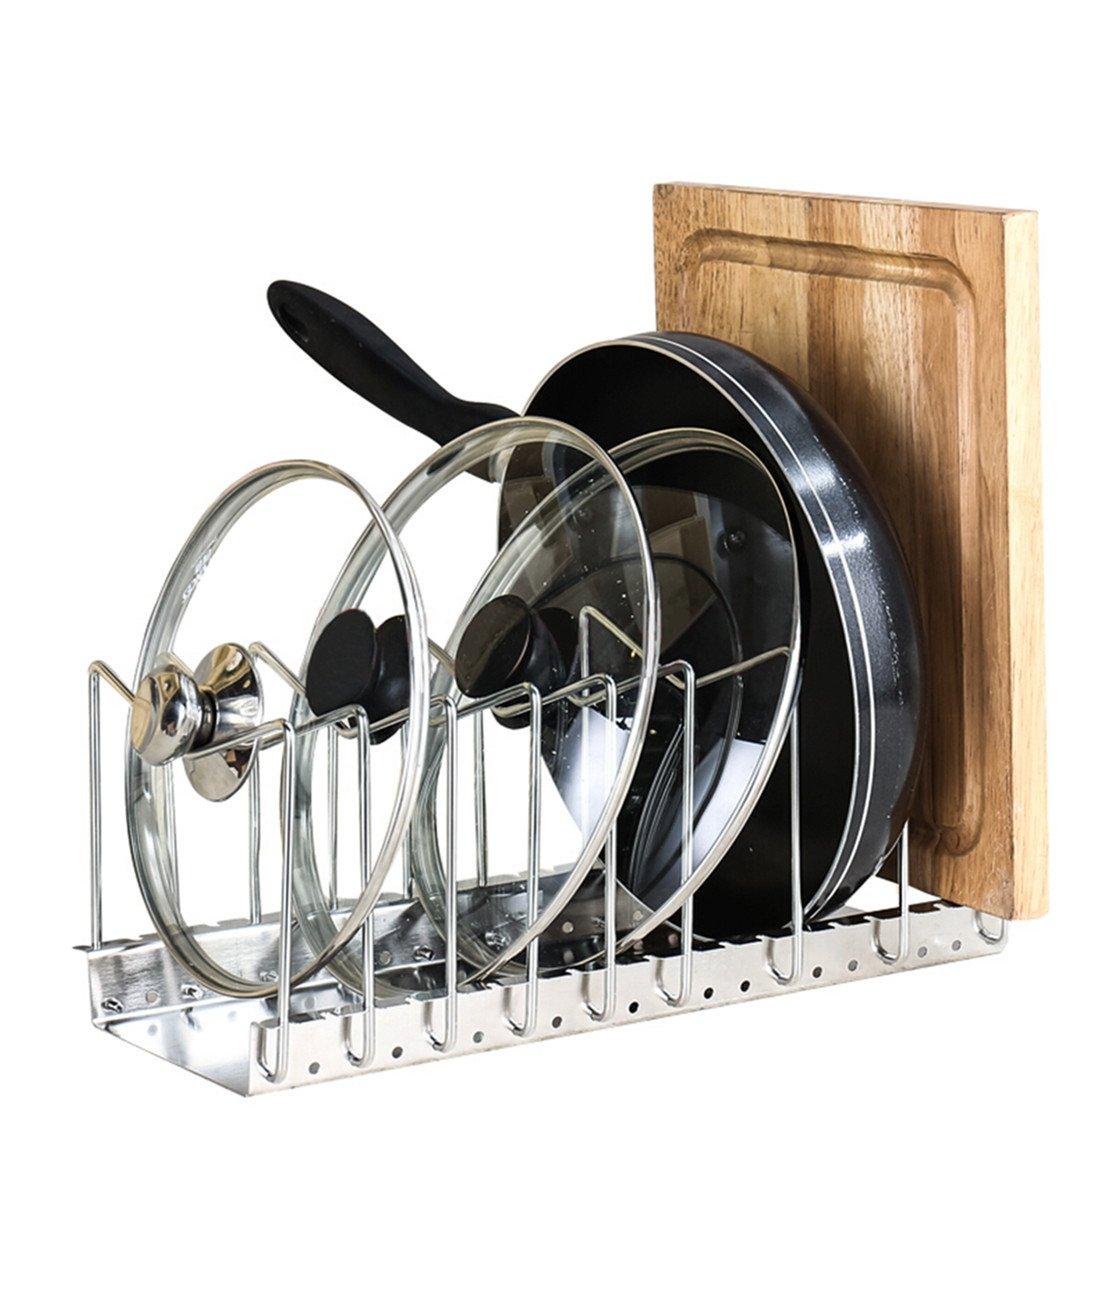 Fecihor Stainless Steel Pan Rack Pot Lid Holder - Adjustable Bakeware Cookware Drying Rack Kitchen Cabinet Pantry and Countertop Organizer